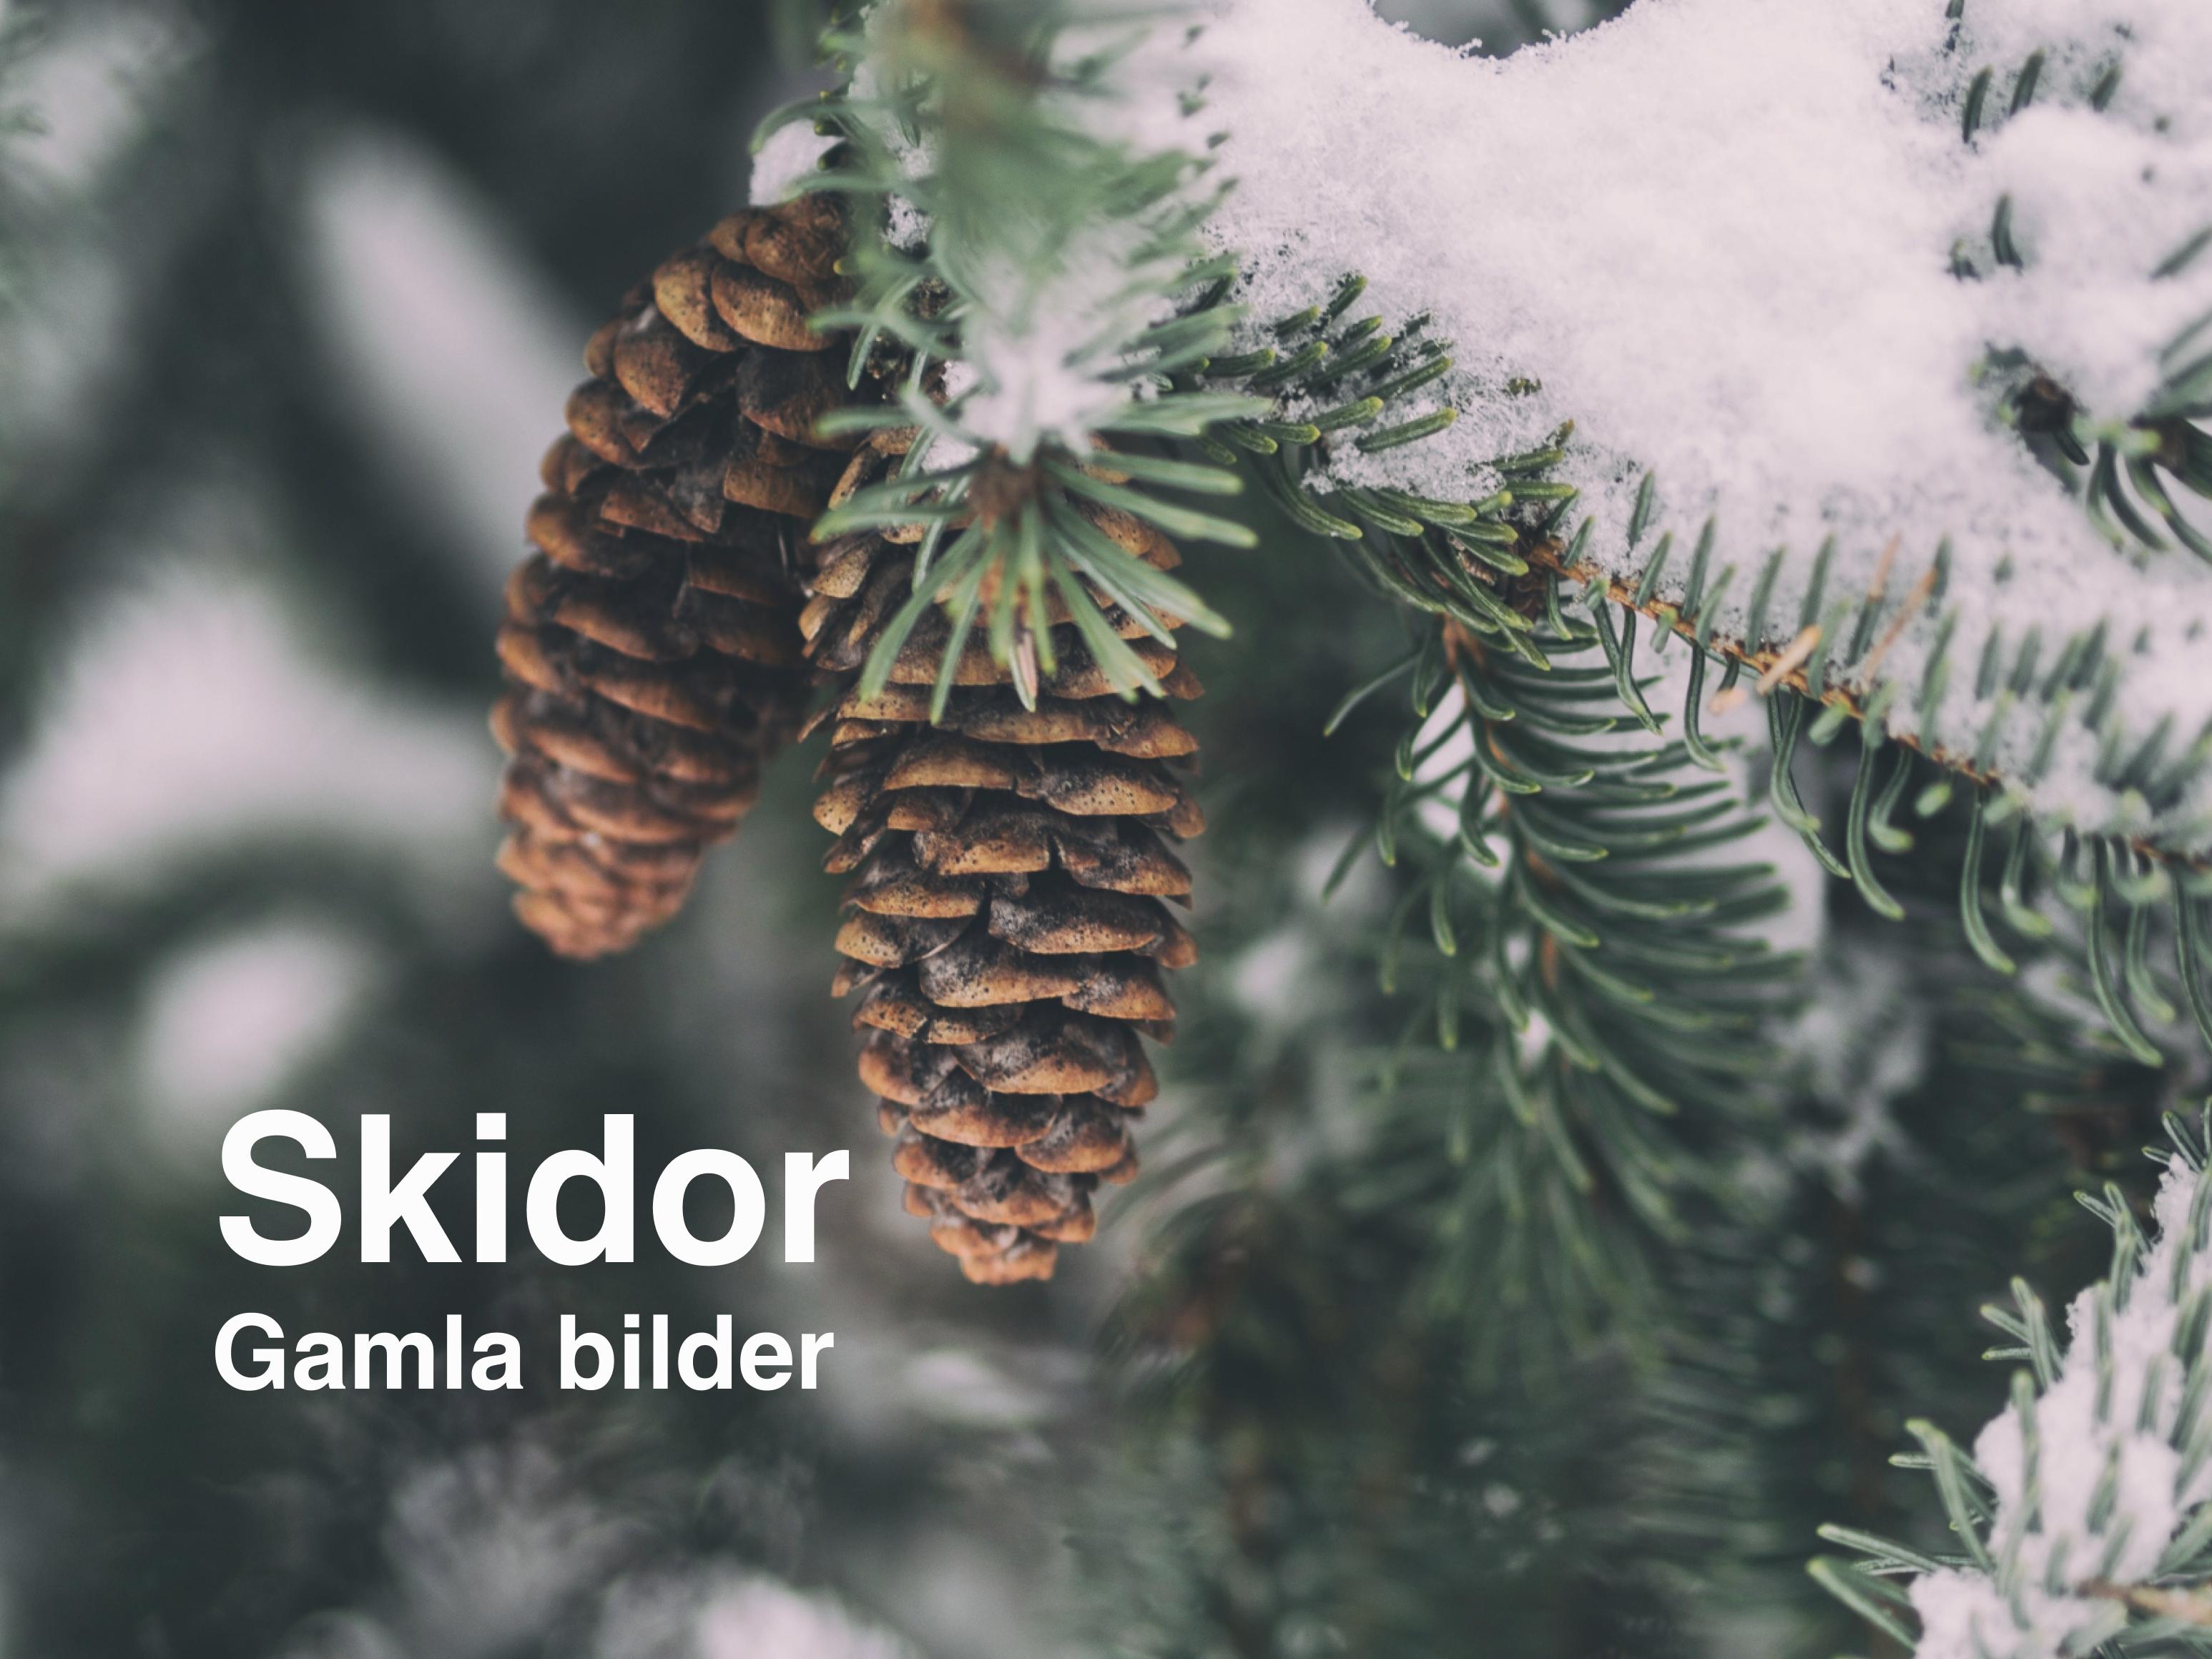 Gamla bilder Skidor